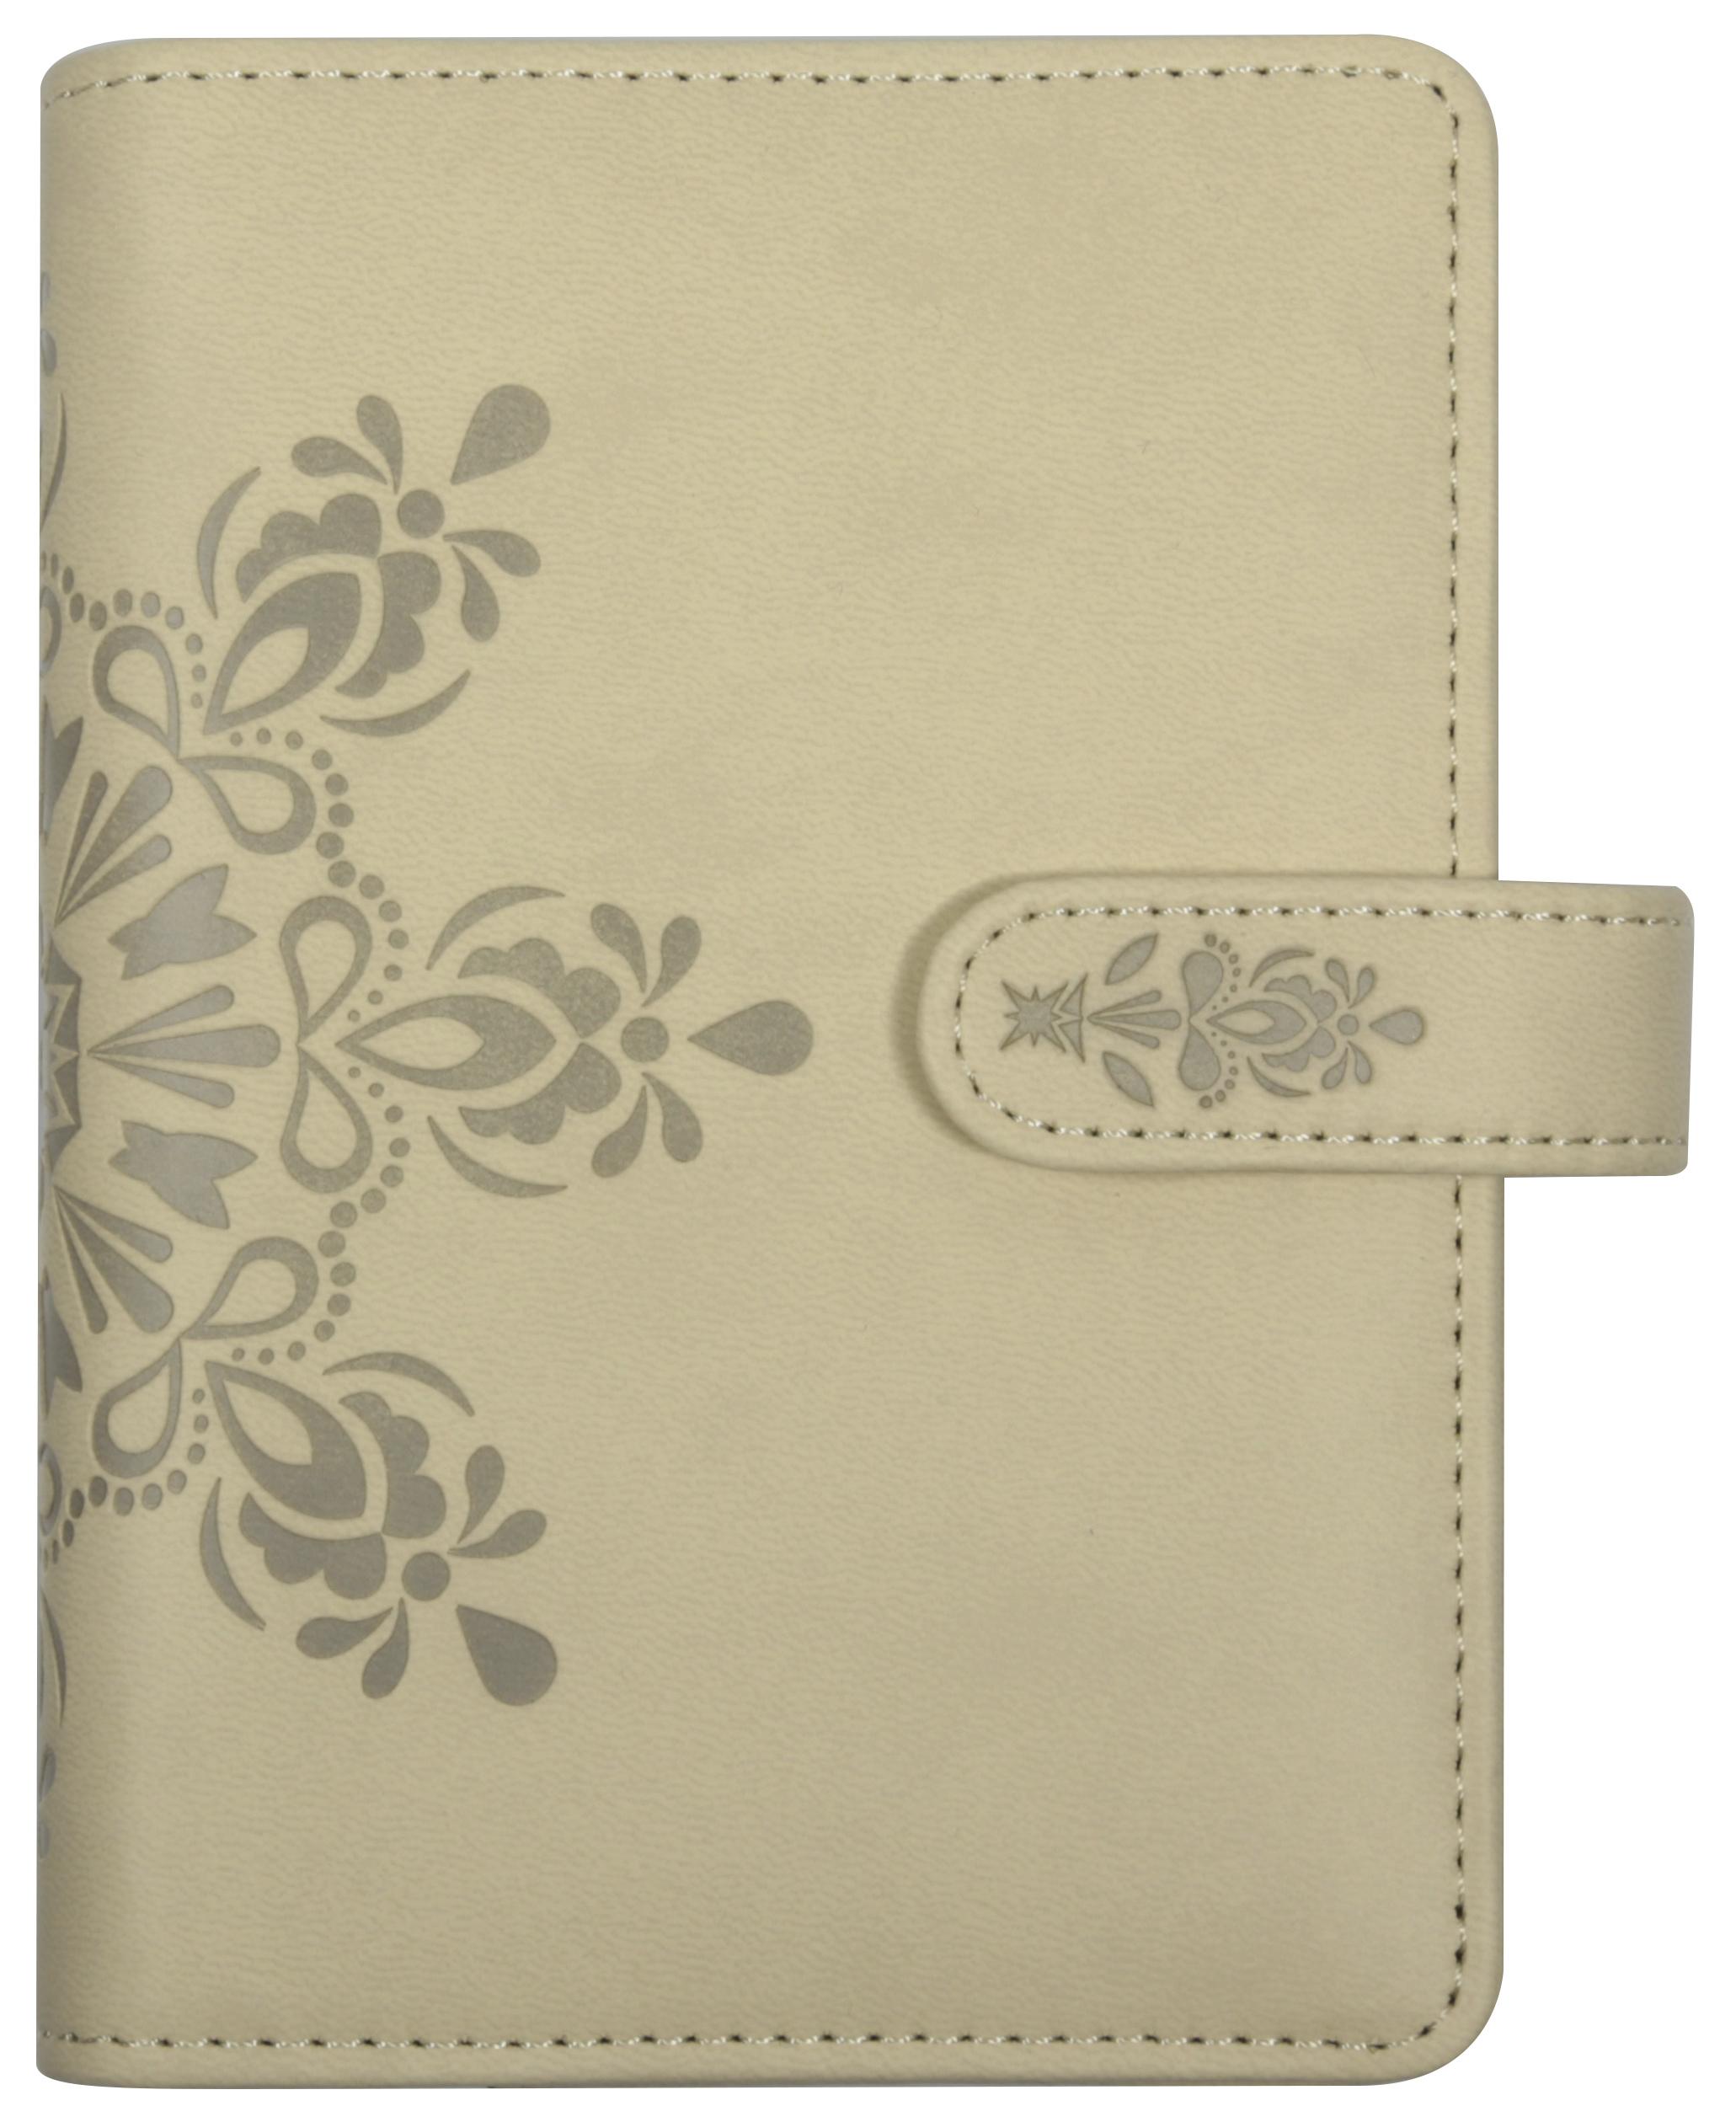 Cordoba - Organiseur 16 mois - 11 x 14,5 cm - ivoire - Exacompta